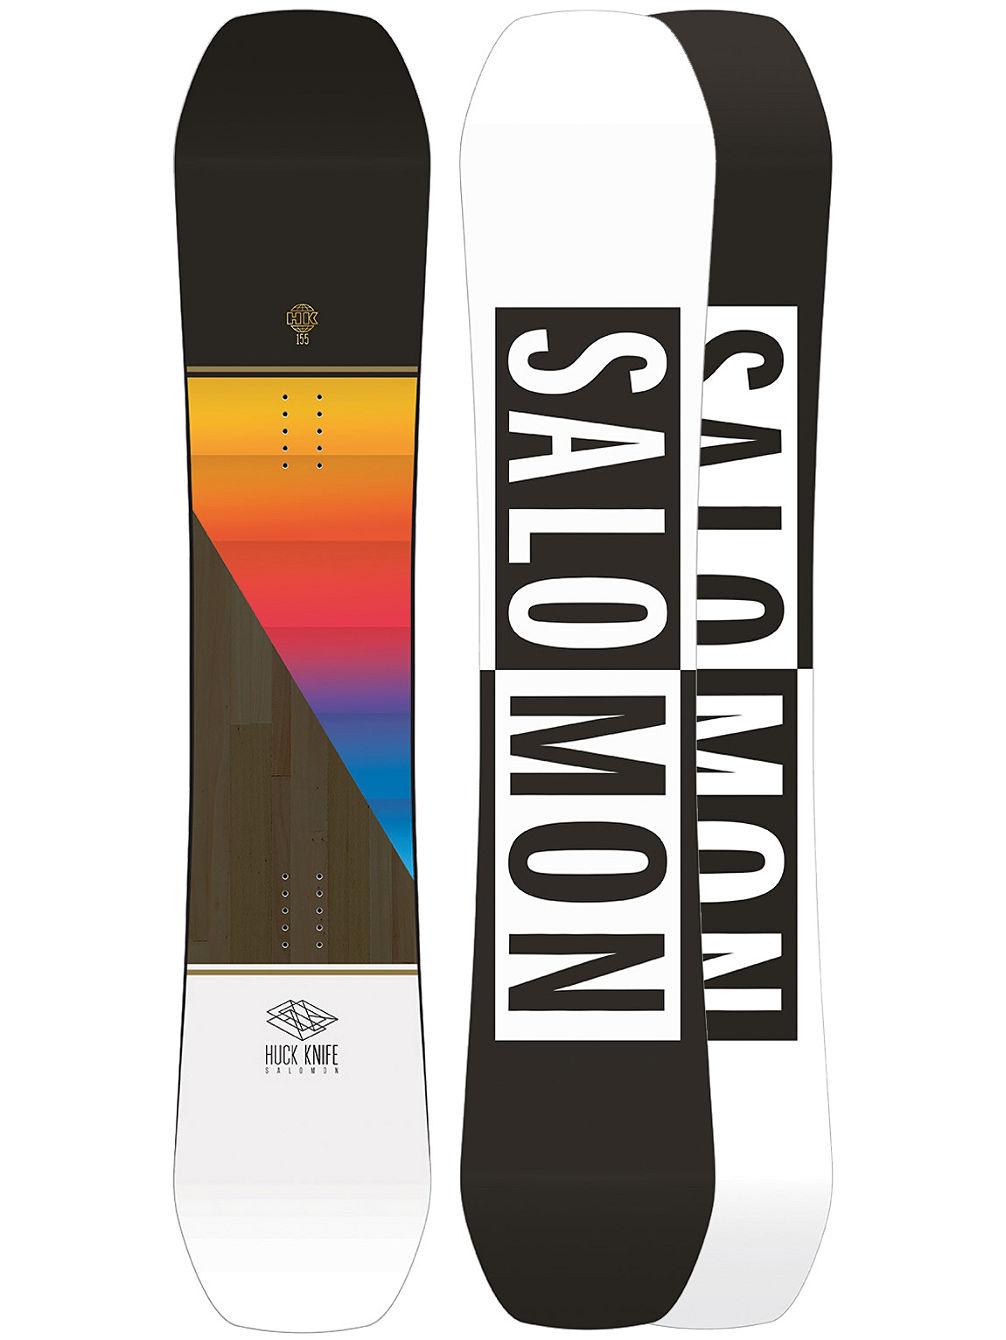 ff301e332db Salomon Huck Knife 152 2019 Snowboard online kopen bij Blue Tomato